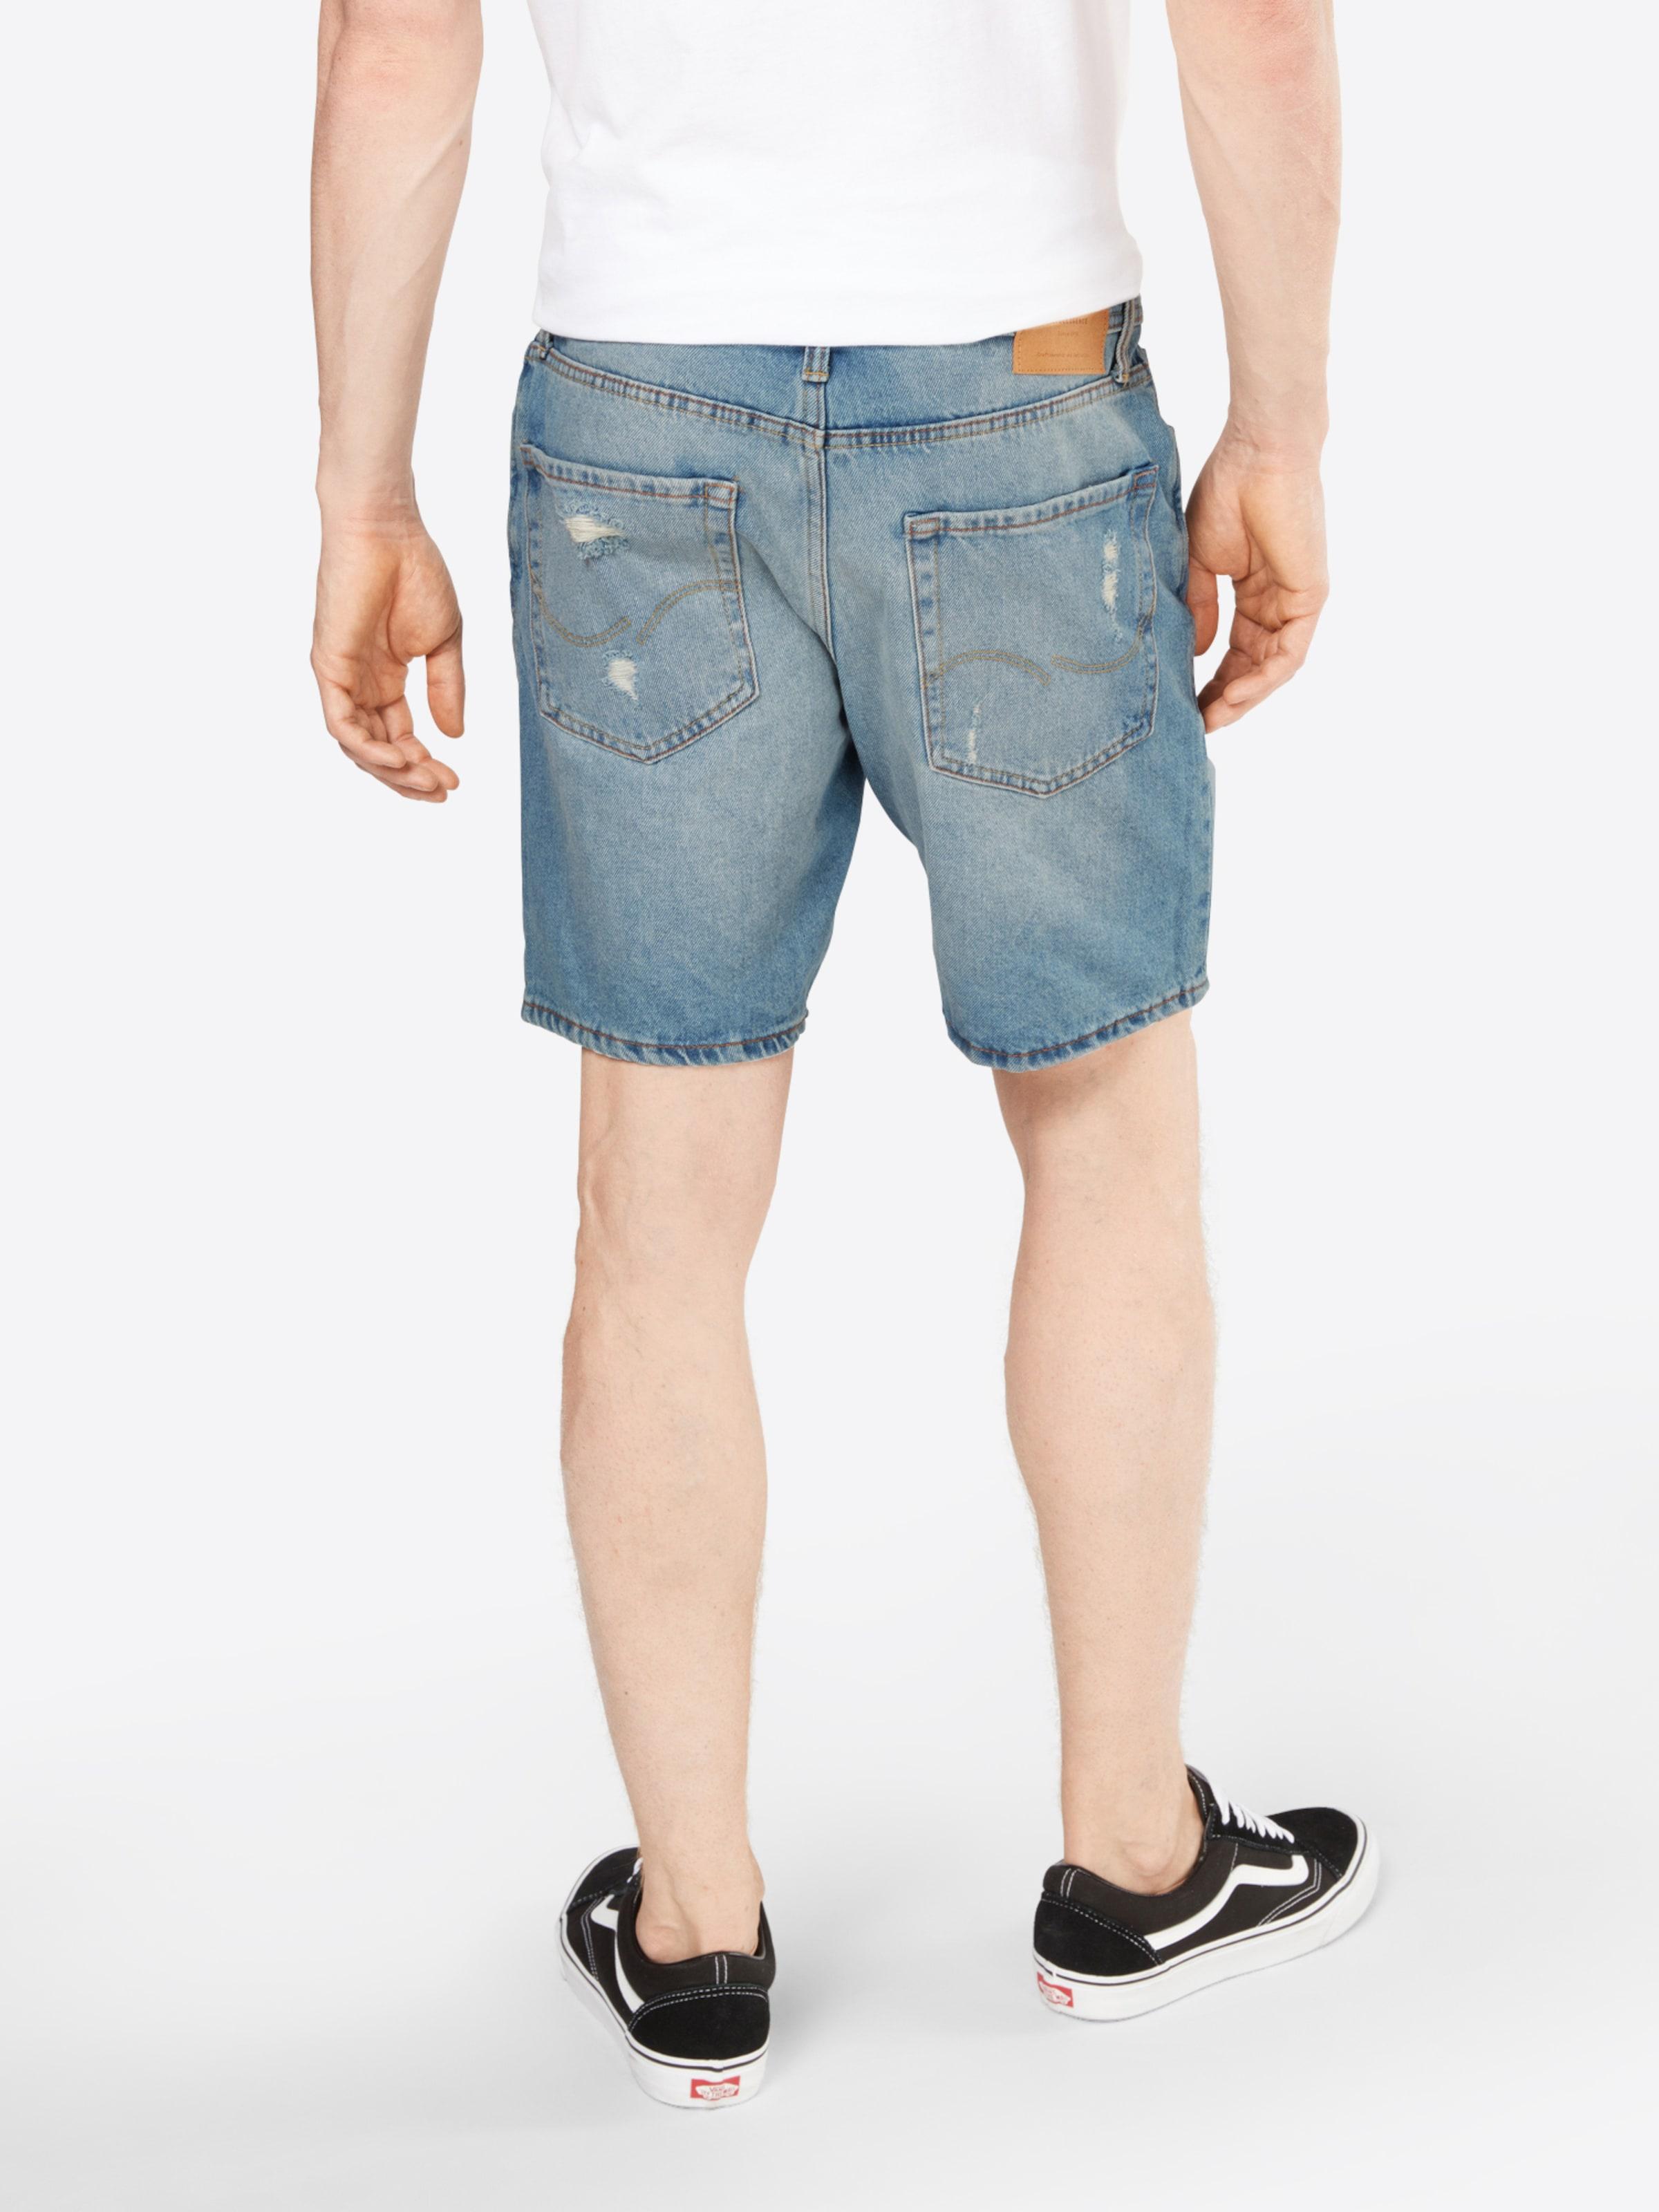 Jackamp; Jones Denim Shorts 'jjirick In Blue Camp' HWED9I2